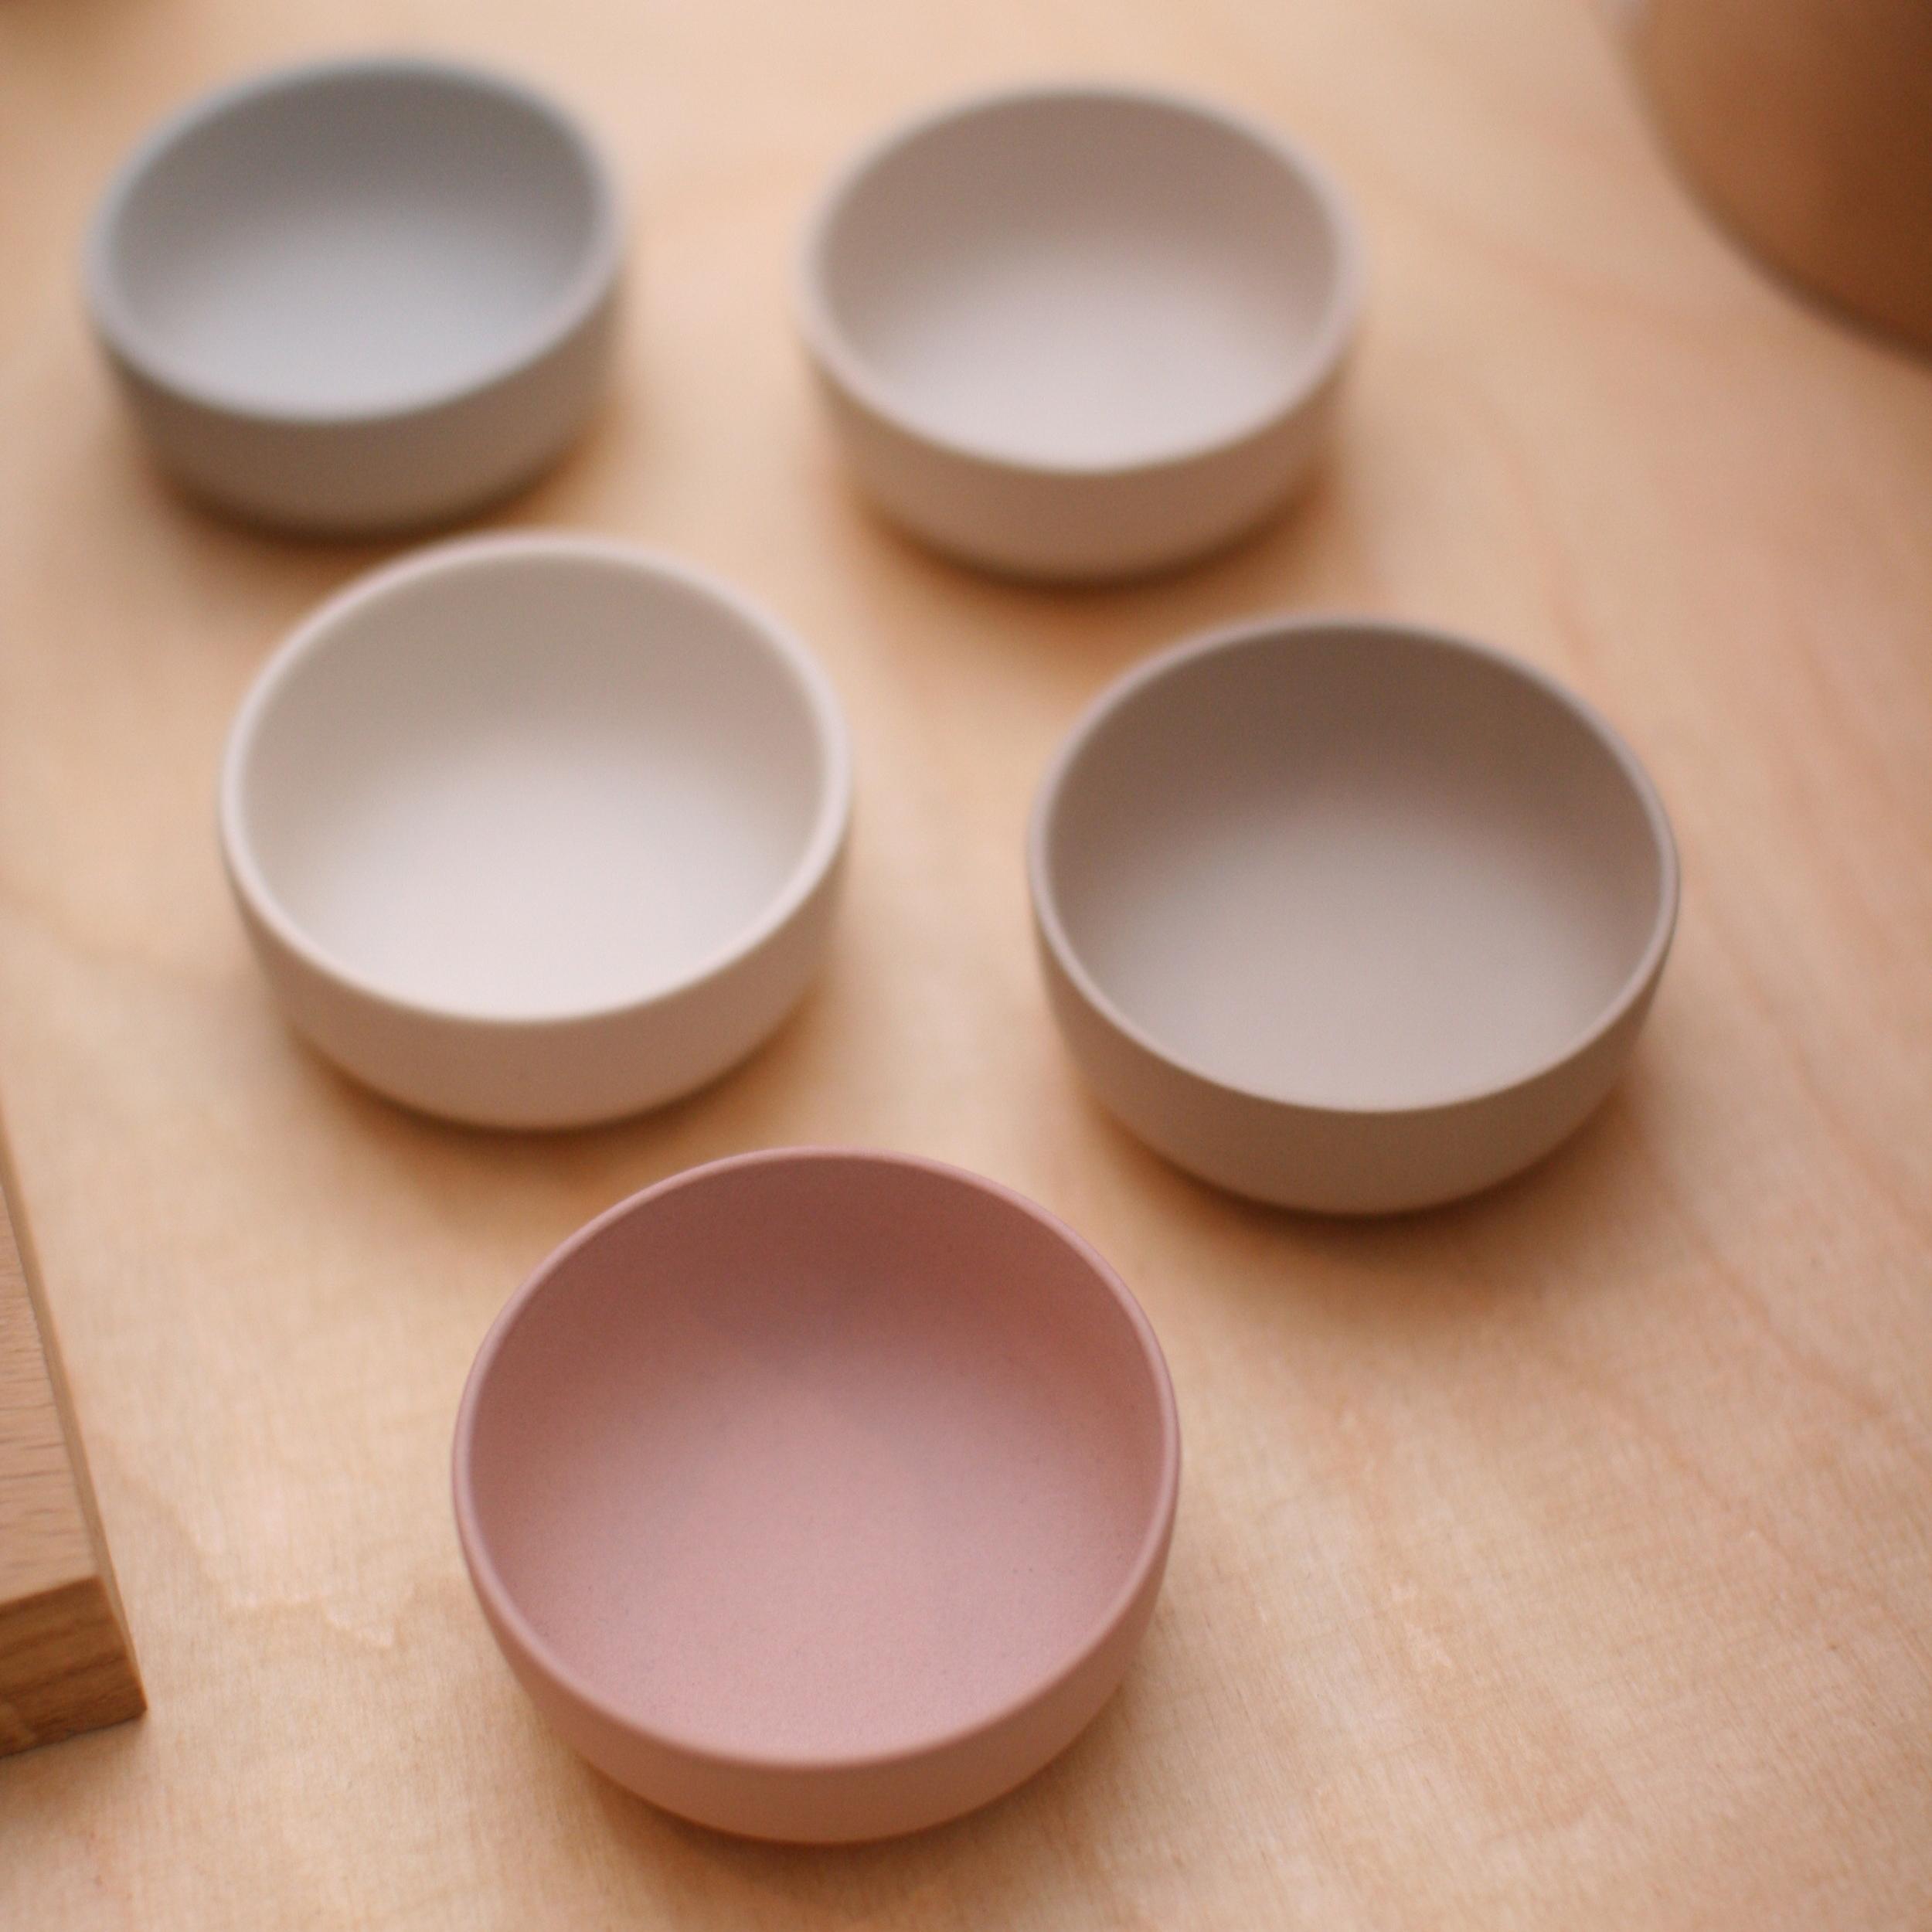 Limited Edition Pinch Pots by local ceramicist, Sue Pryke.